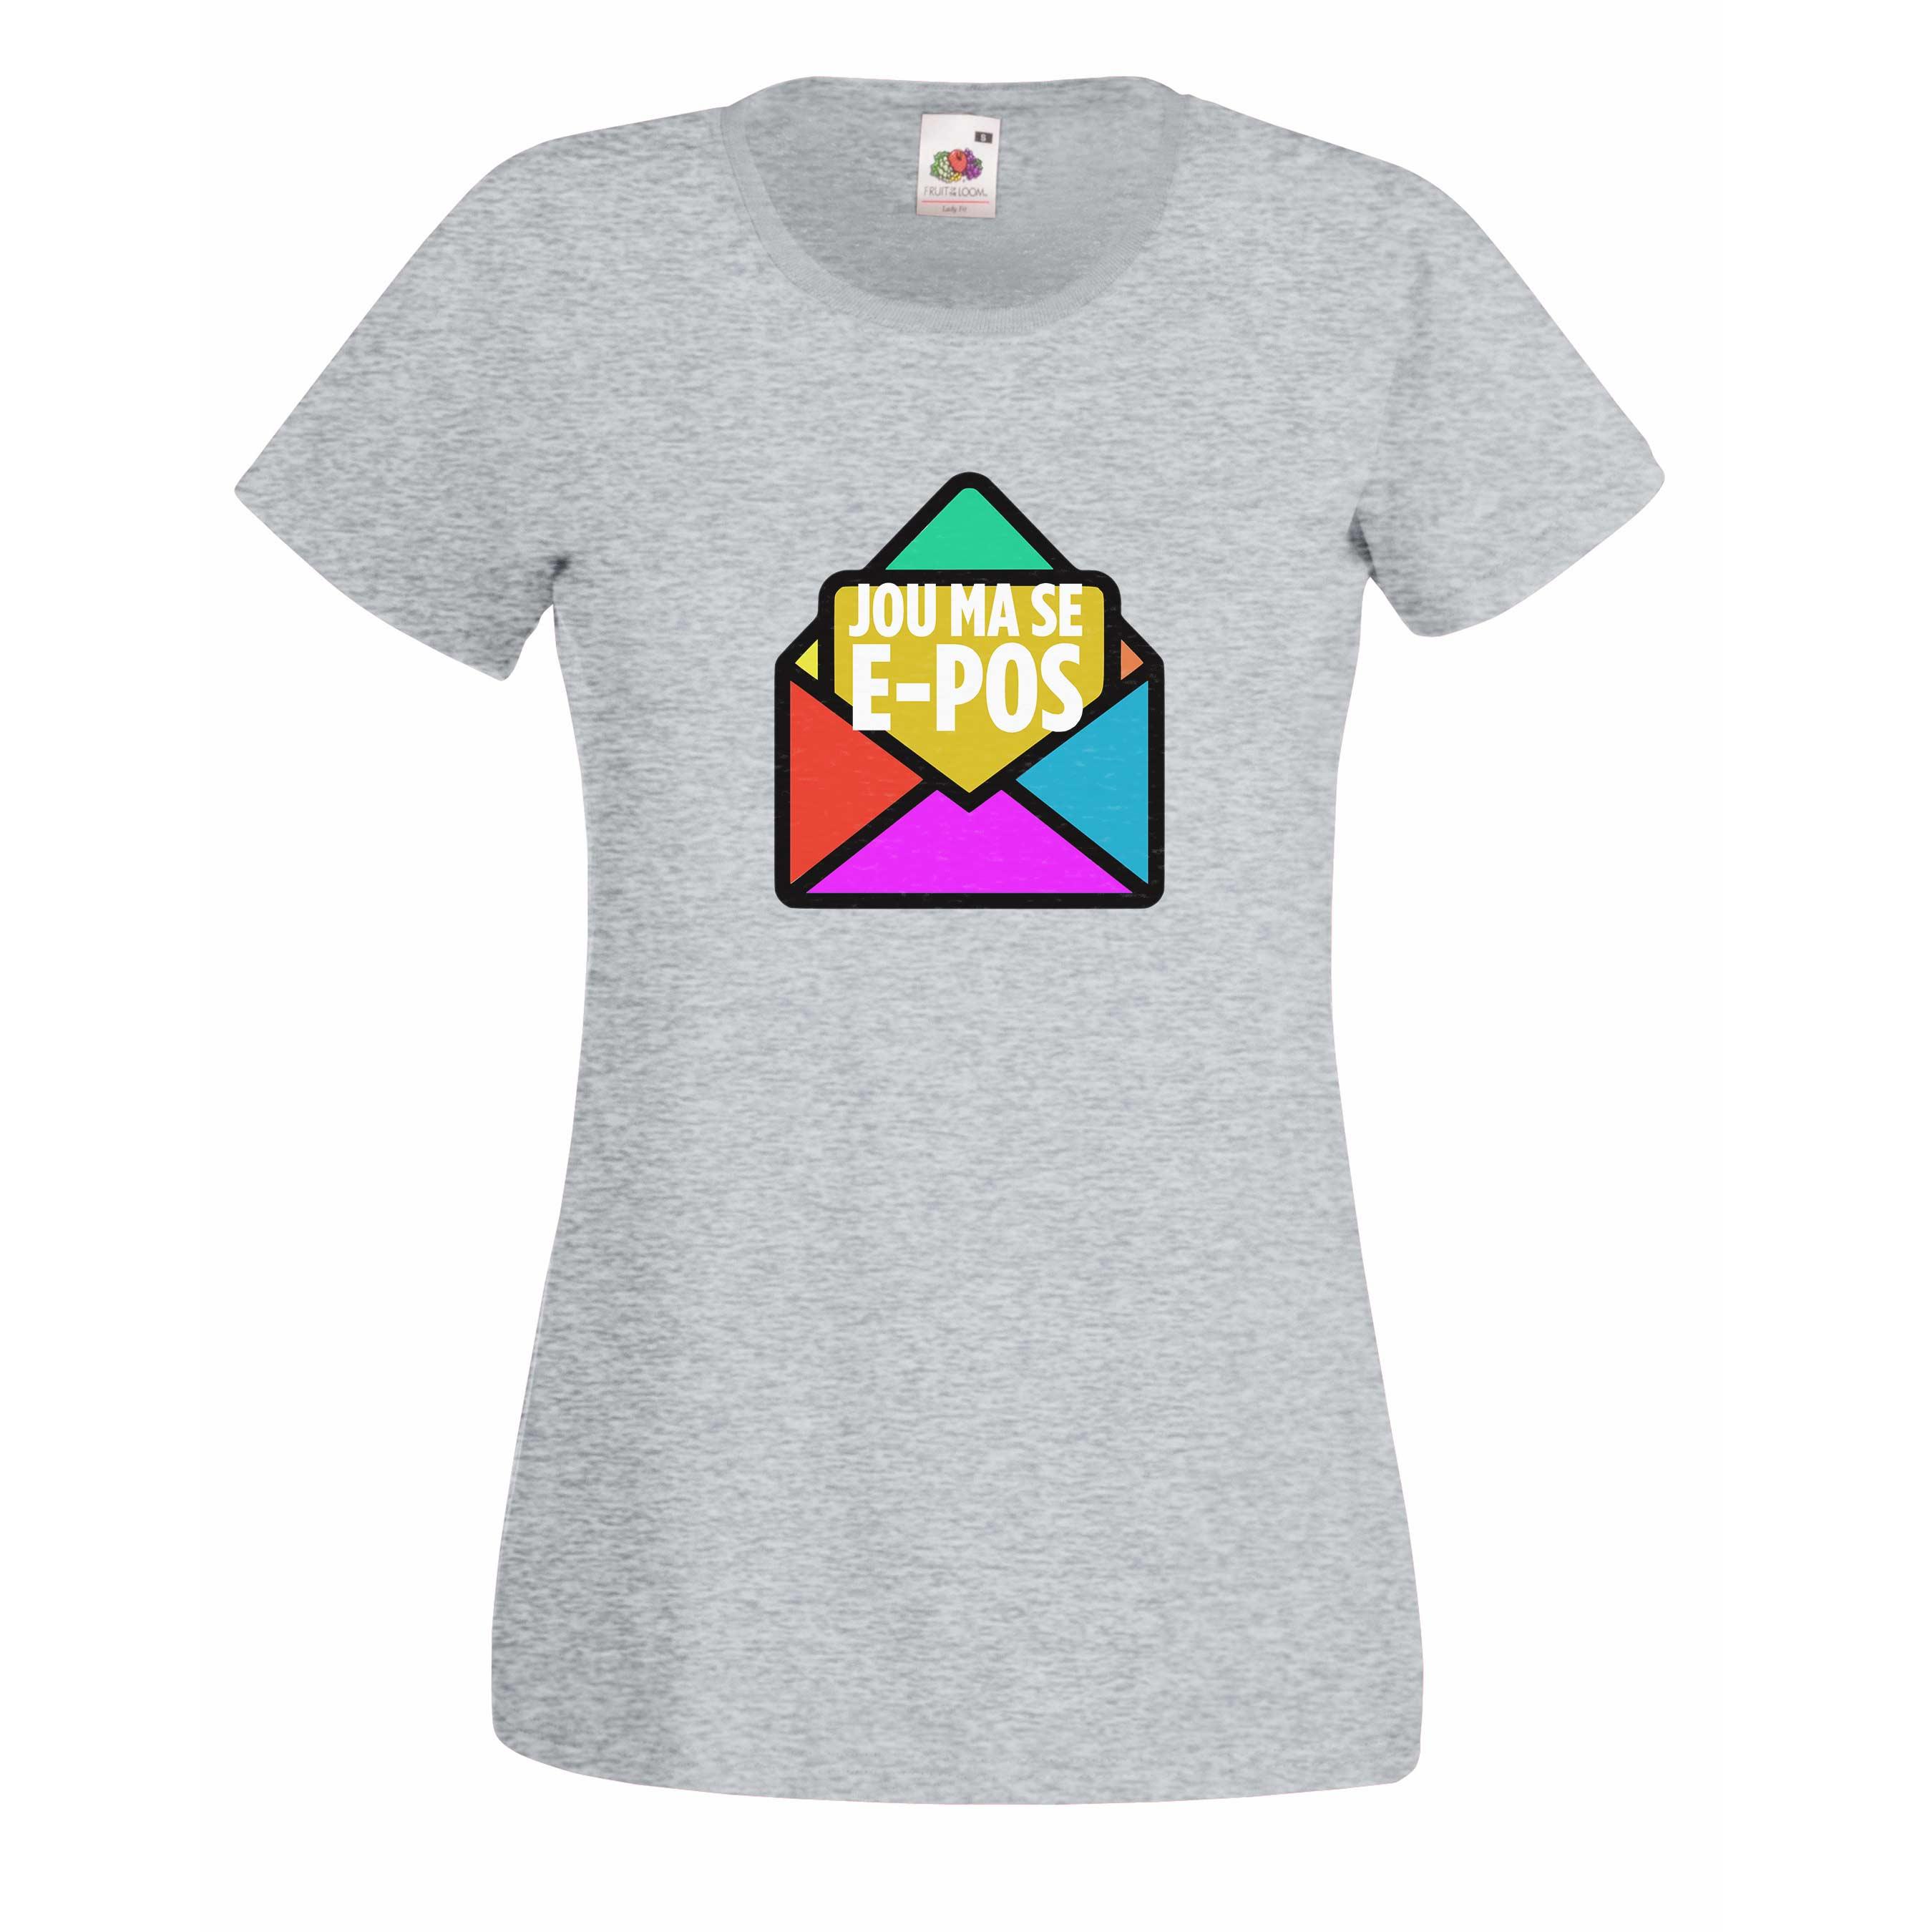 Jou Ma Se E-Pos design for t-shirt, hoodie & sweatshirt